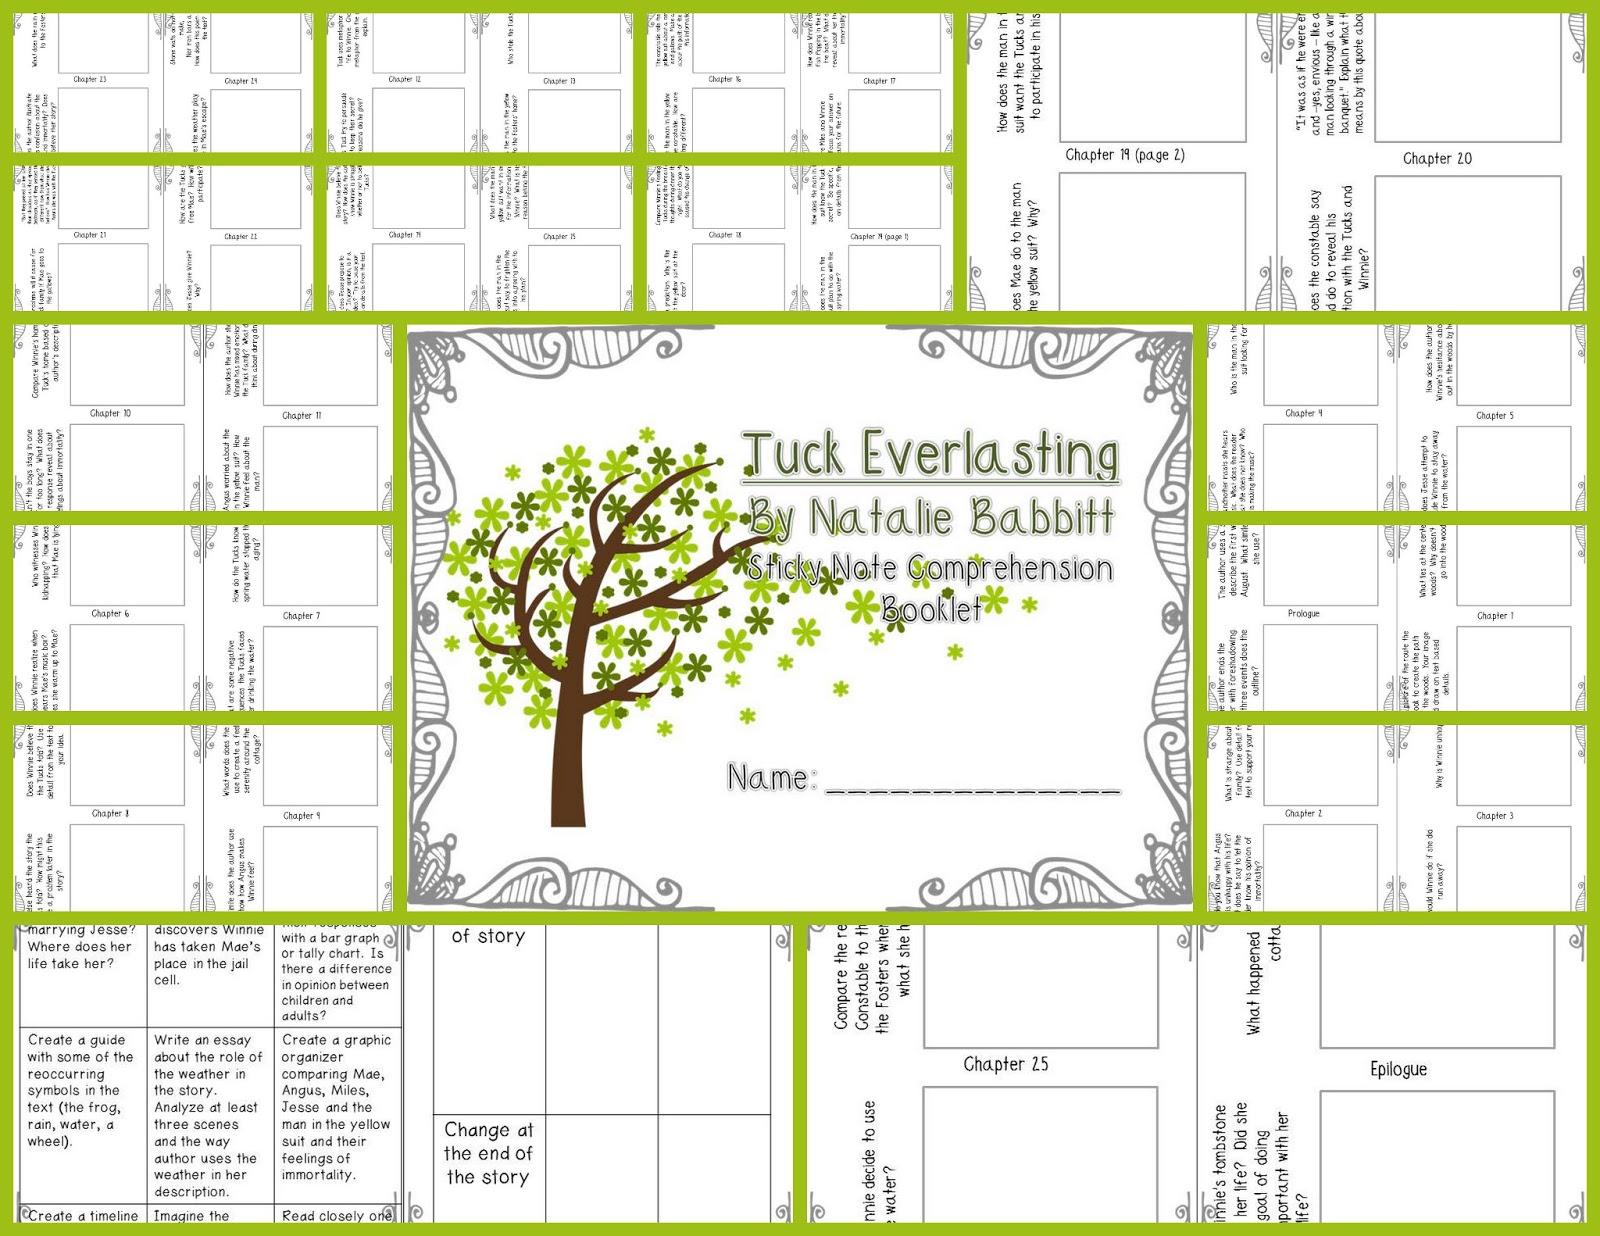 Printables Tuck Everlasting Worksheets Happywheelsfreak Thousands Of Printable Activities